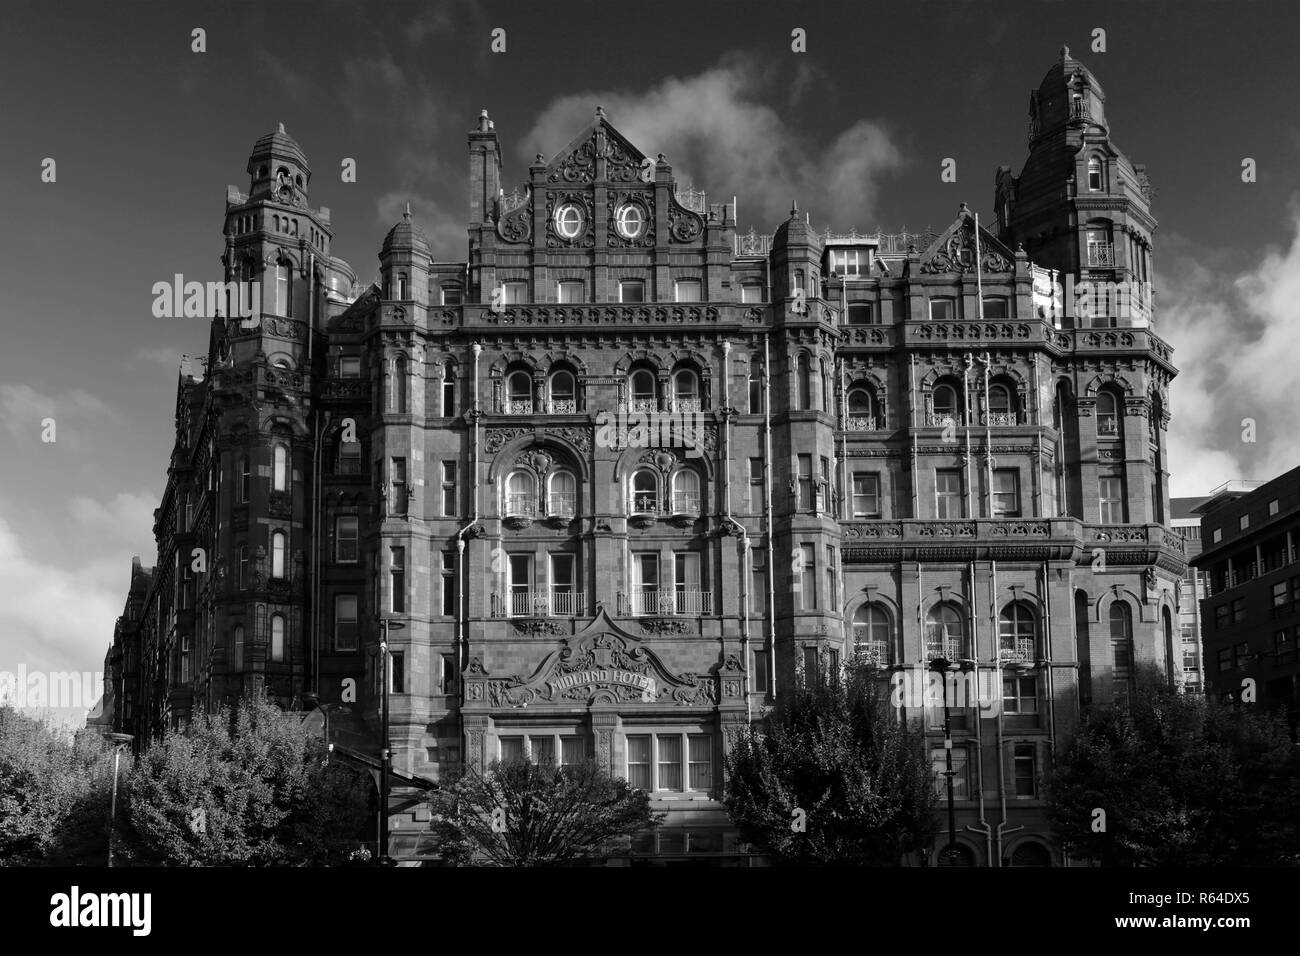 The Midland Hotel, 16 Peter St, Manchester City Centre, Manchester, Lancashire, England, UK - Stock Image